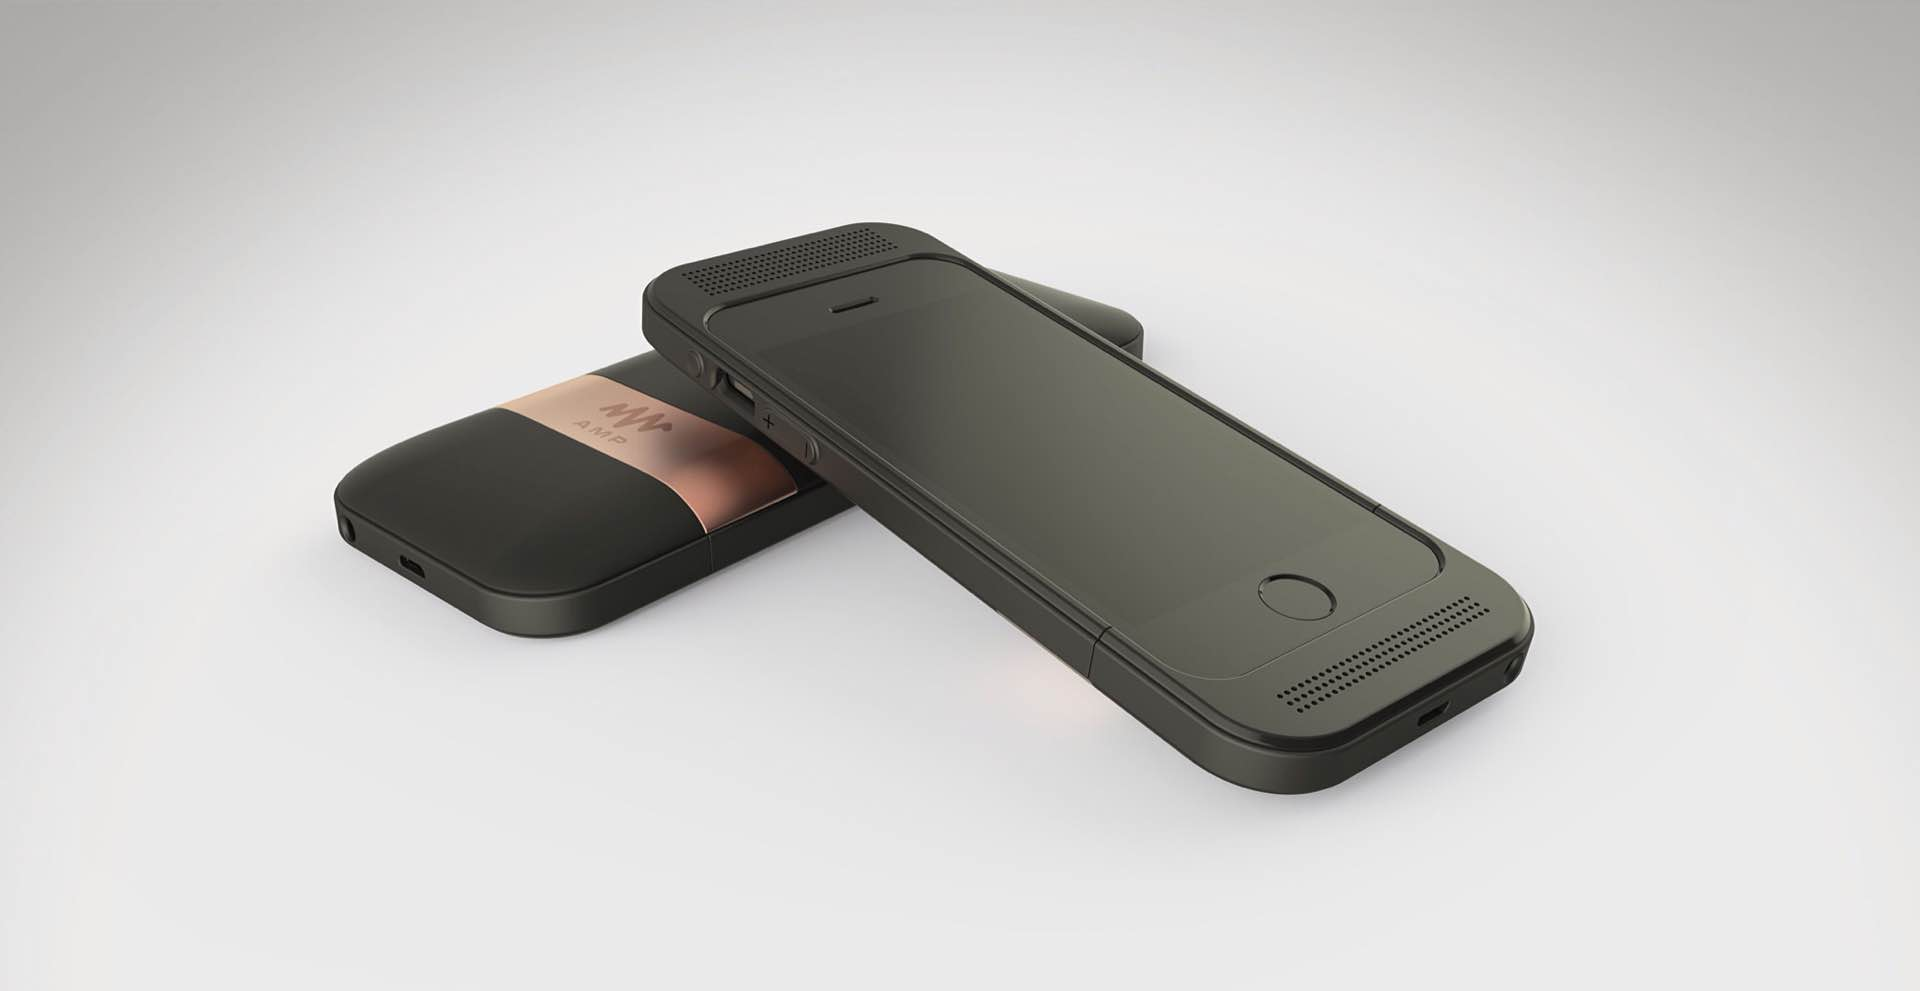 amp-speaker-case-for-iphone-img